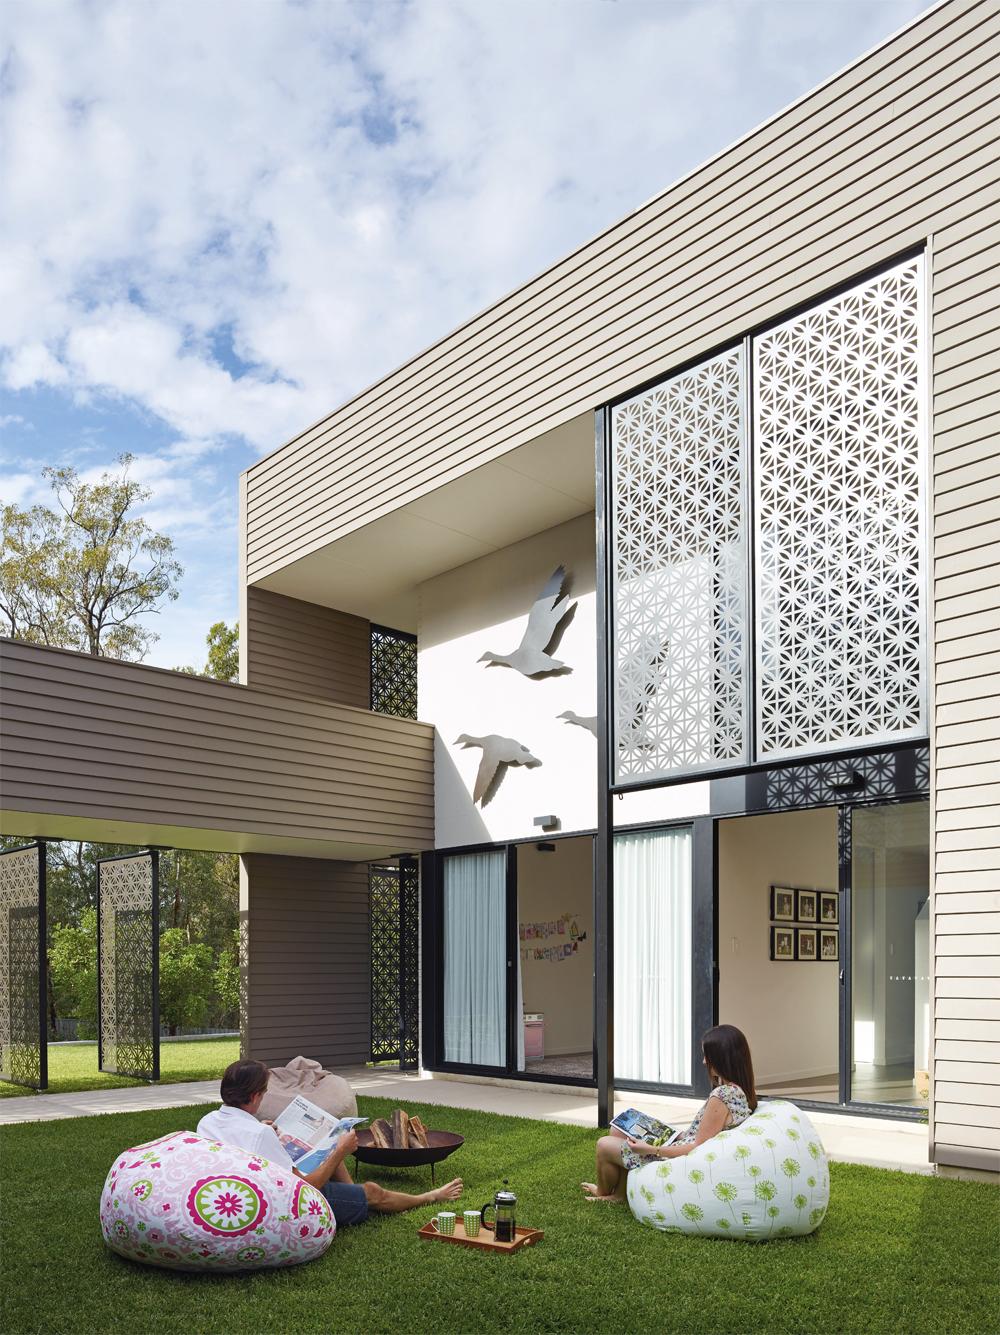 Grand Designs Australia: High Flyer - Architects' masterpiece - exterior: courtyard